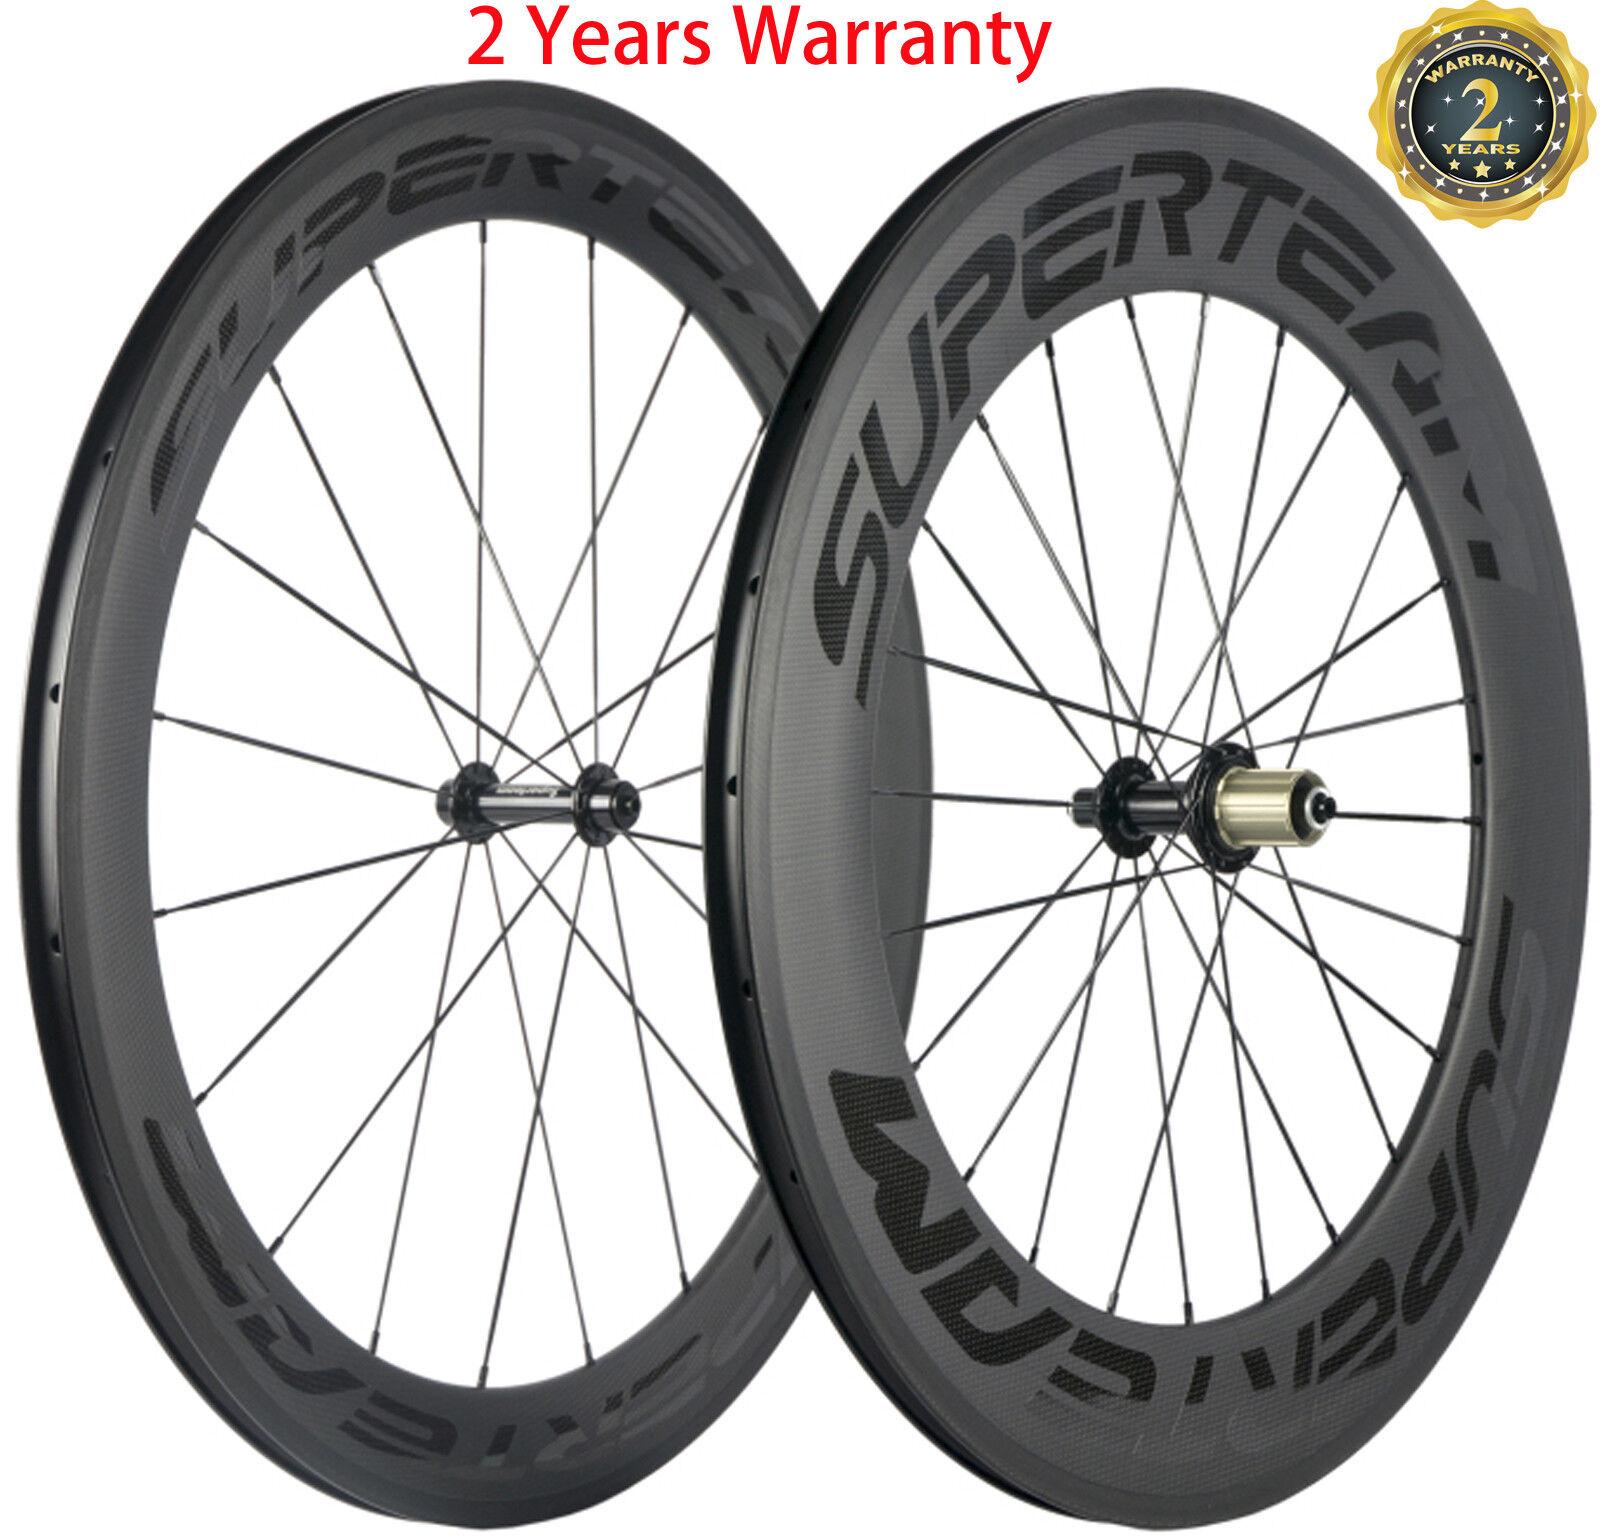 700C Bicycle Wheels Front 60mm Rear 88mm Carbon Wheels Ceramic Bearing Wheelset